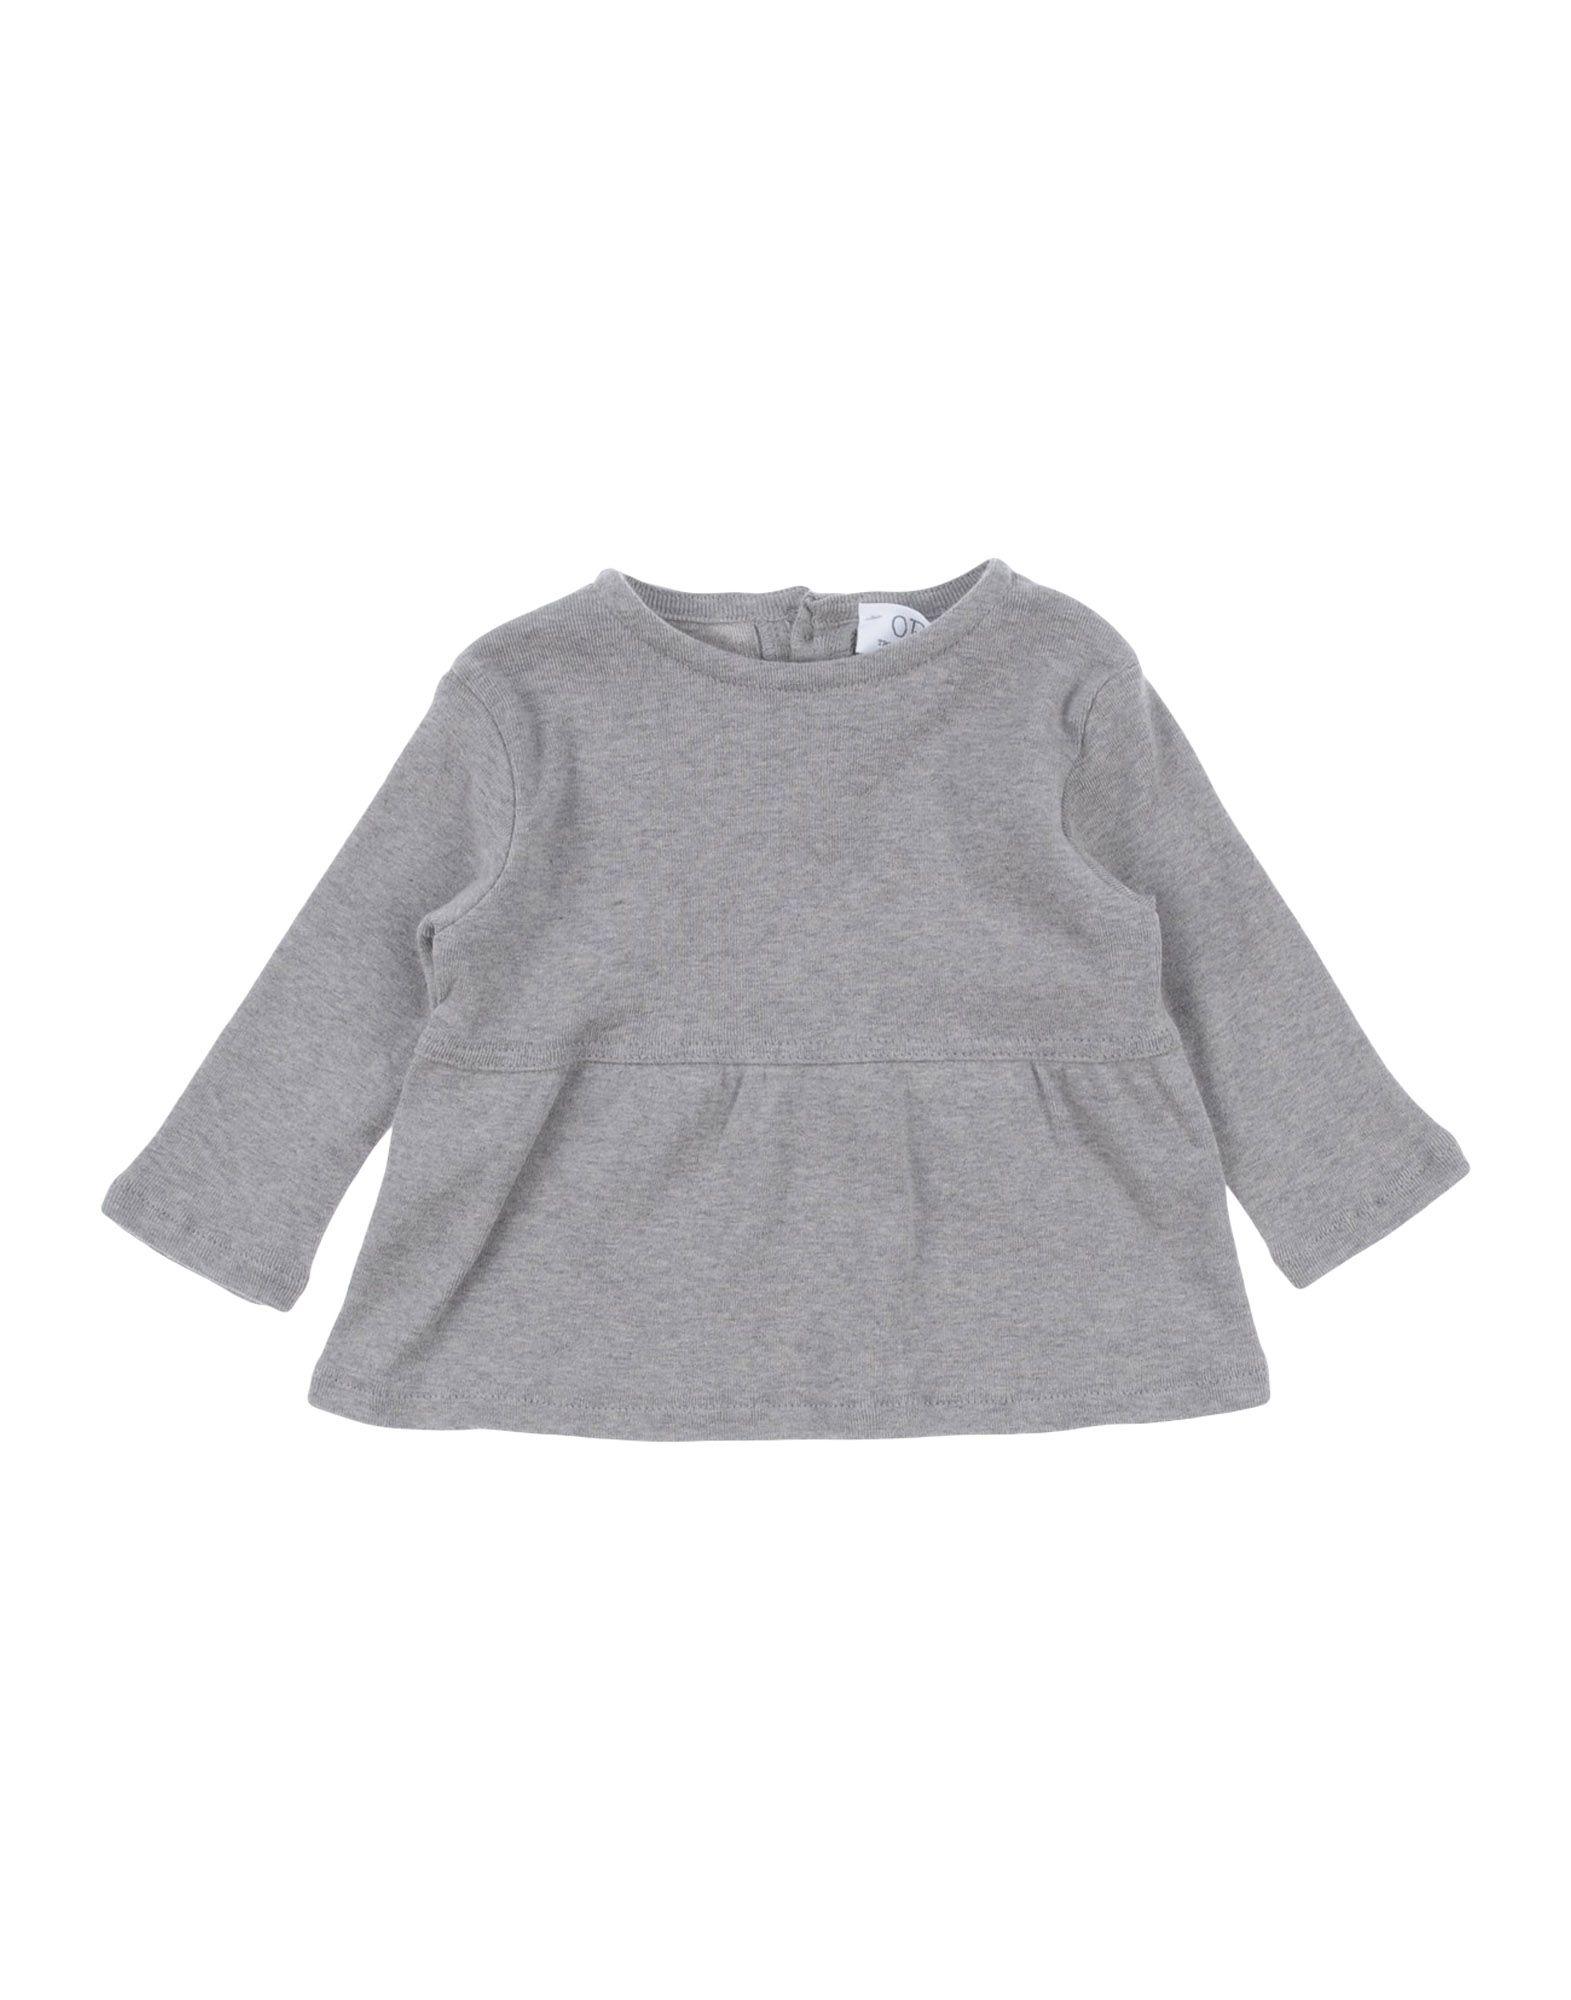 OPILILAI T-Shirt in Grey